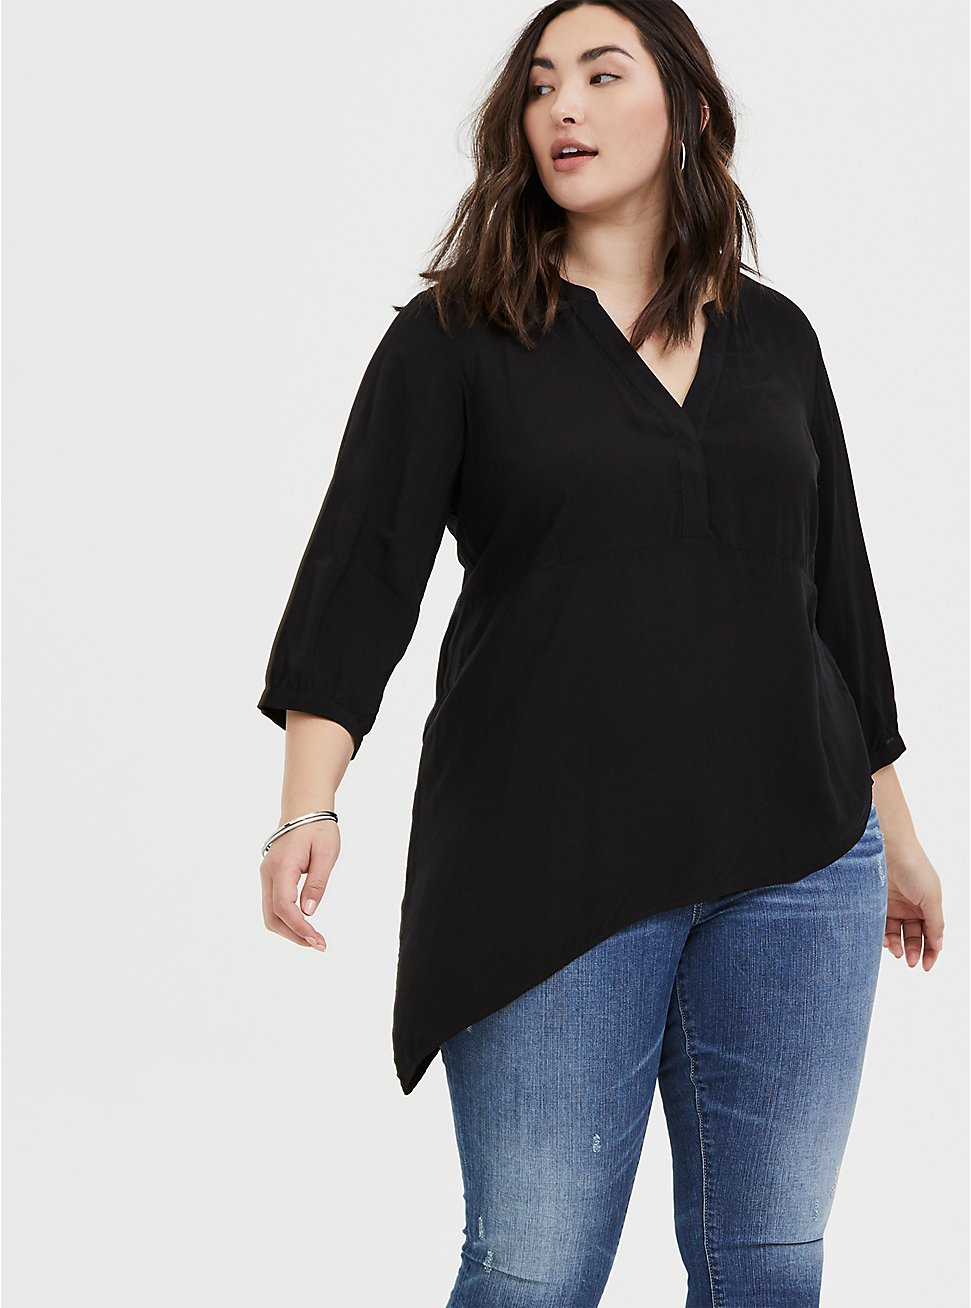 Black Challis Asymmetrical Tunic Blouse, DEEP BLACK, hi-res